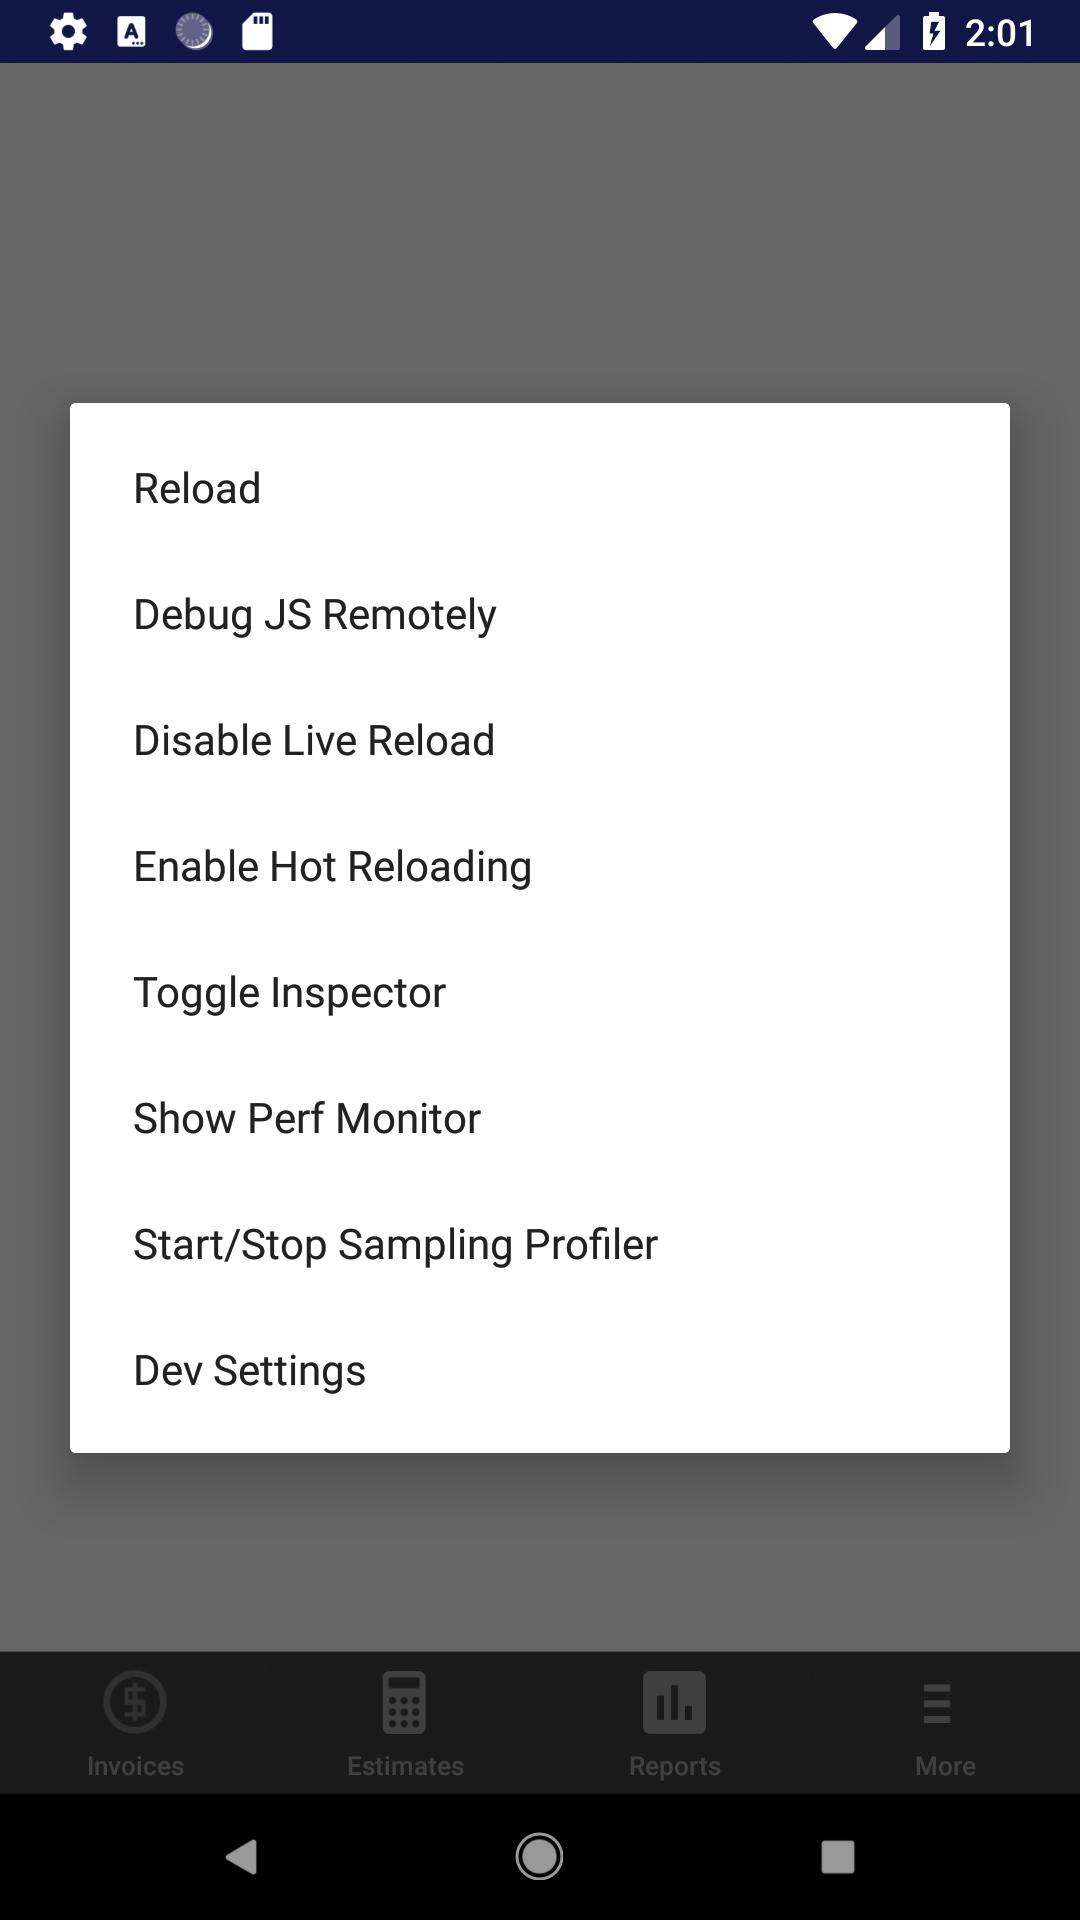 android/sdk/platform-tools/api/annotations.zip